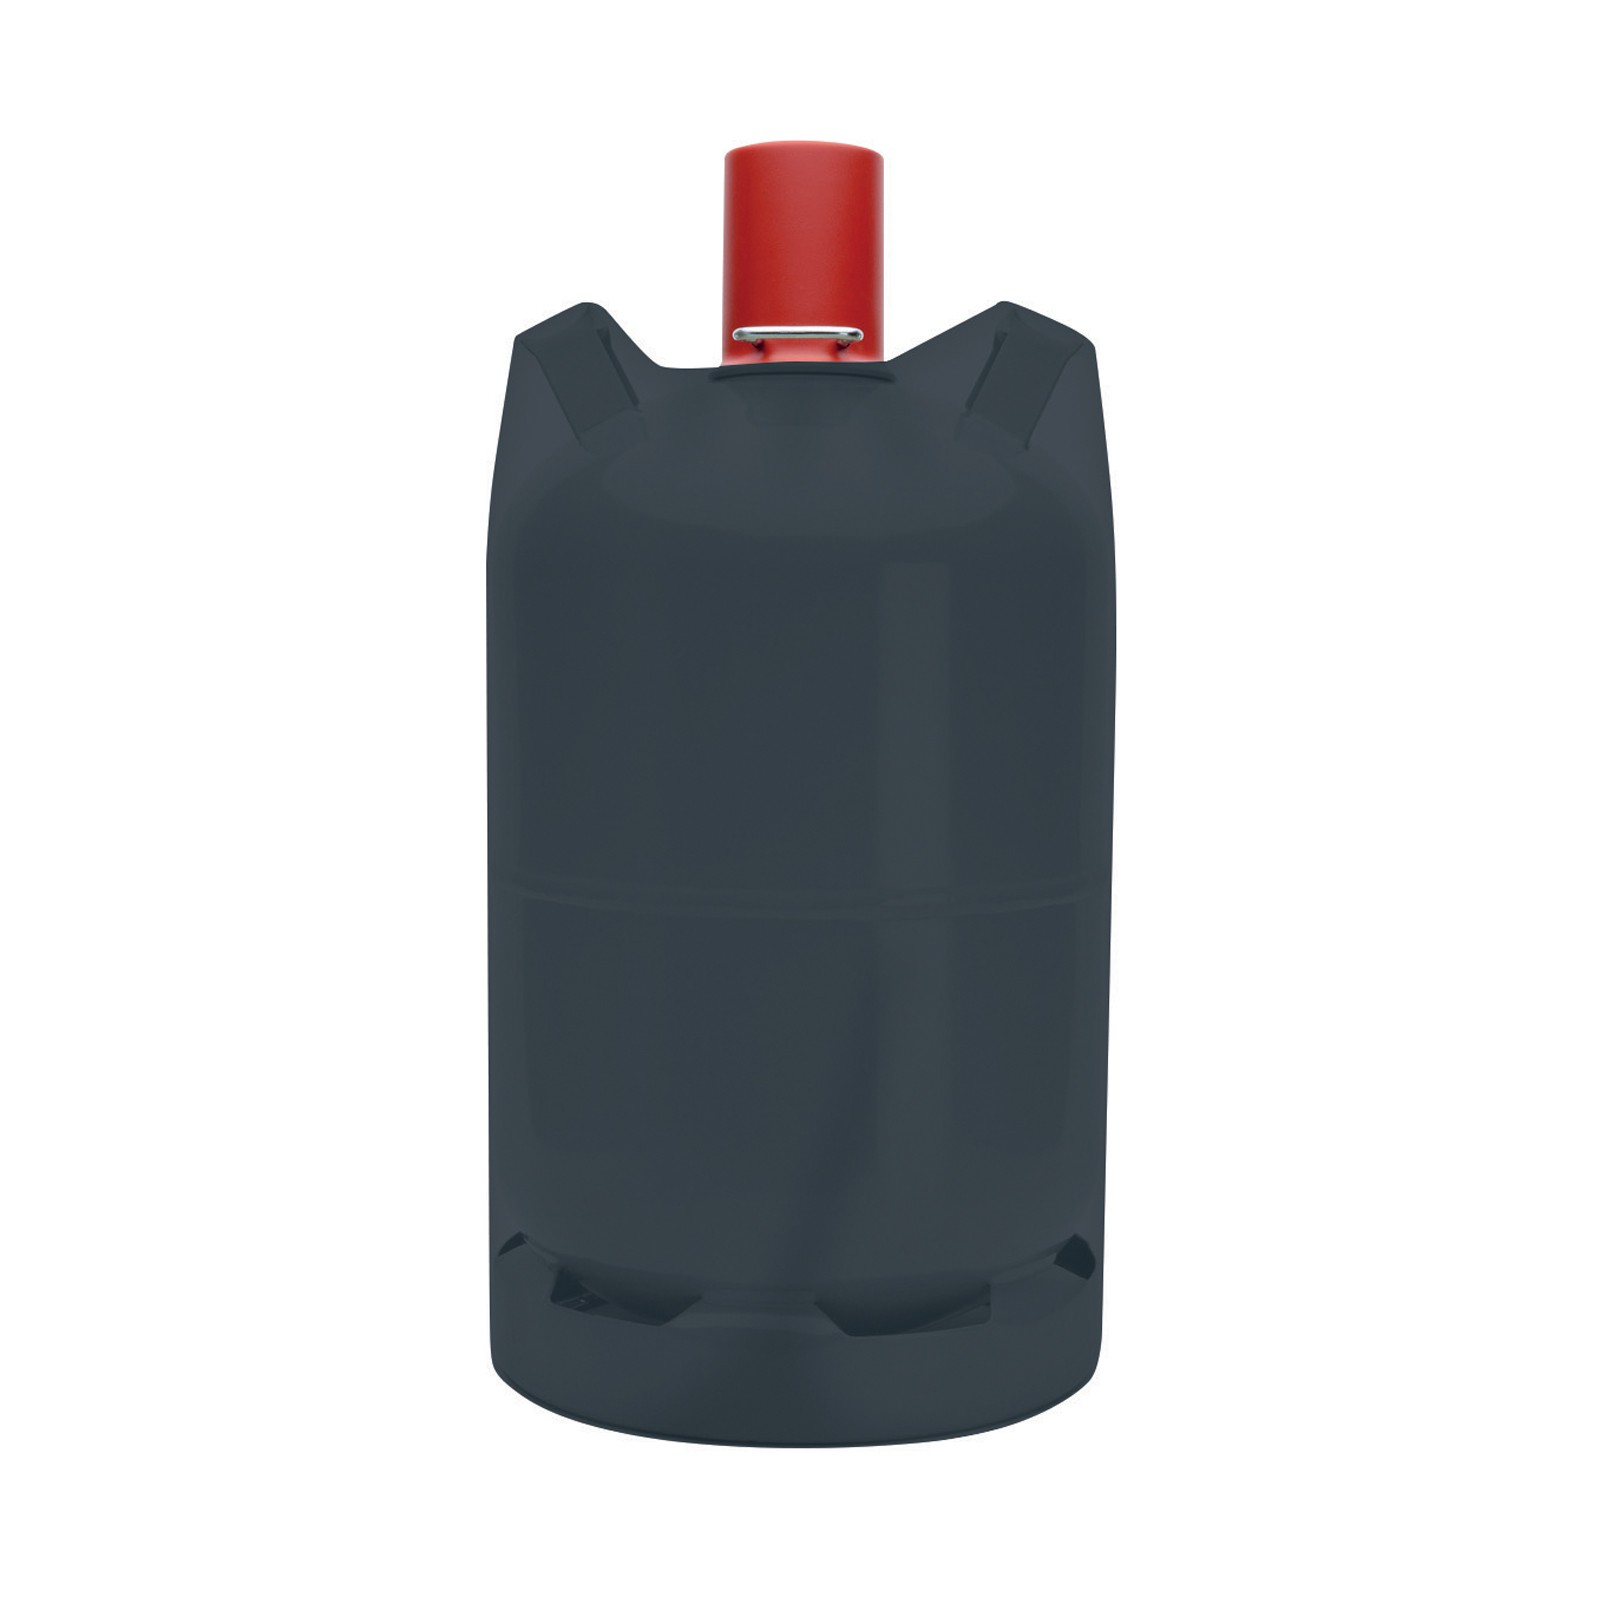 tepro schutzh lle f r 5 kg gasflasche schwarz. Black Bedroom Furniture Sets. Home Design Ideas